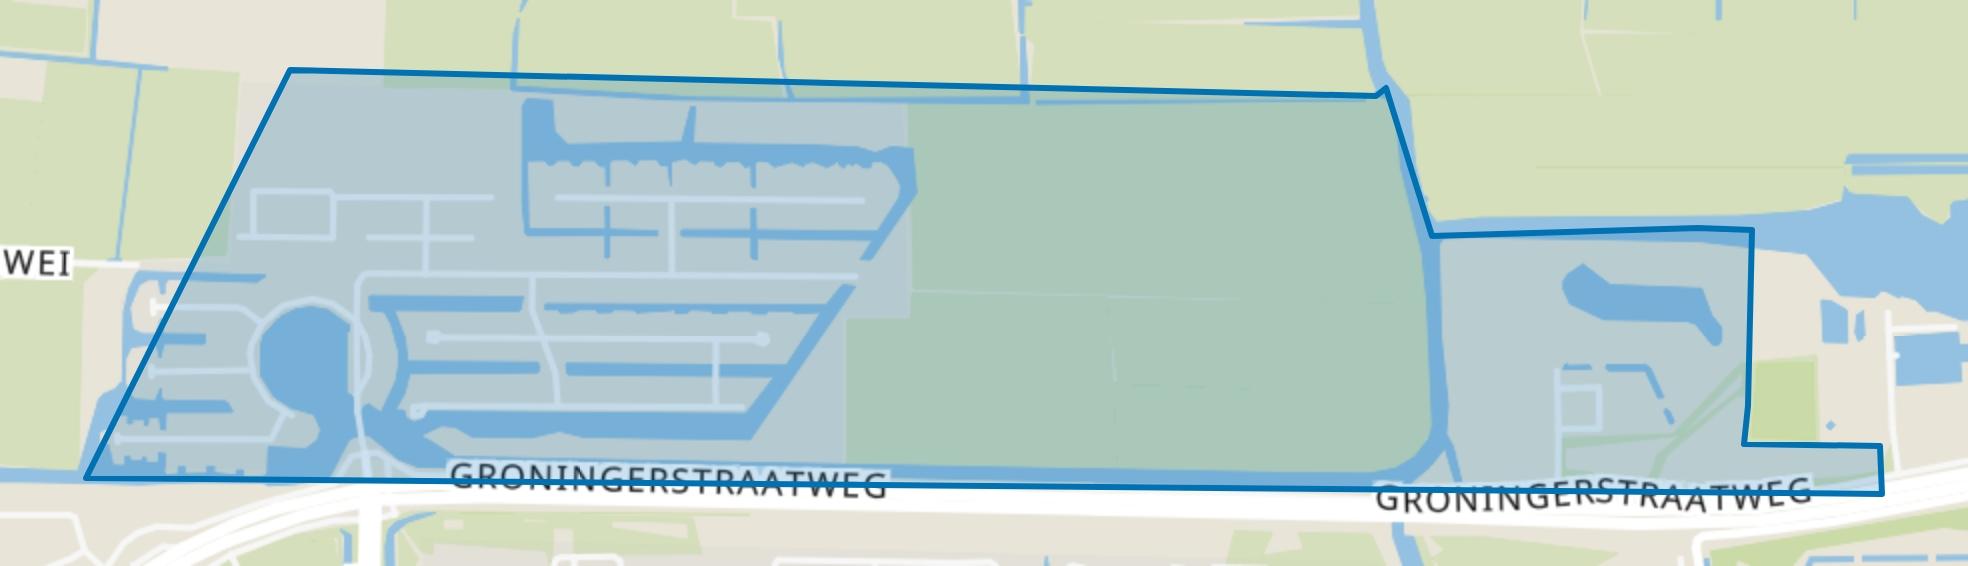 Blitsaerd, Leeuwarden map